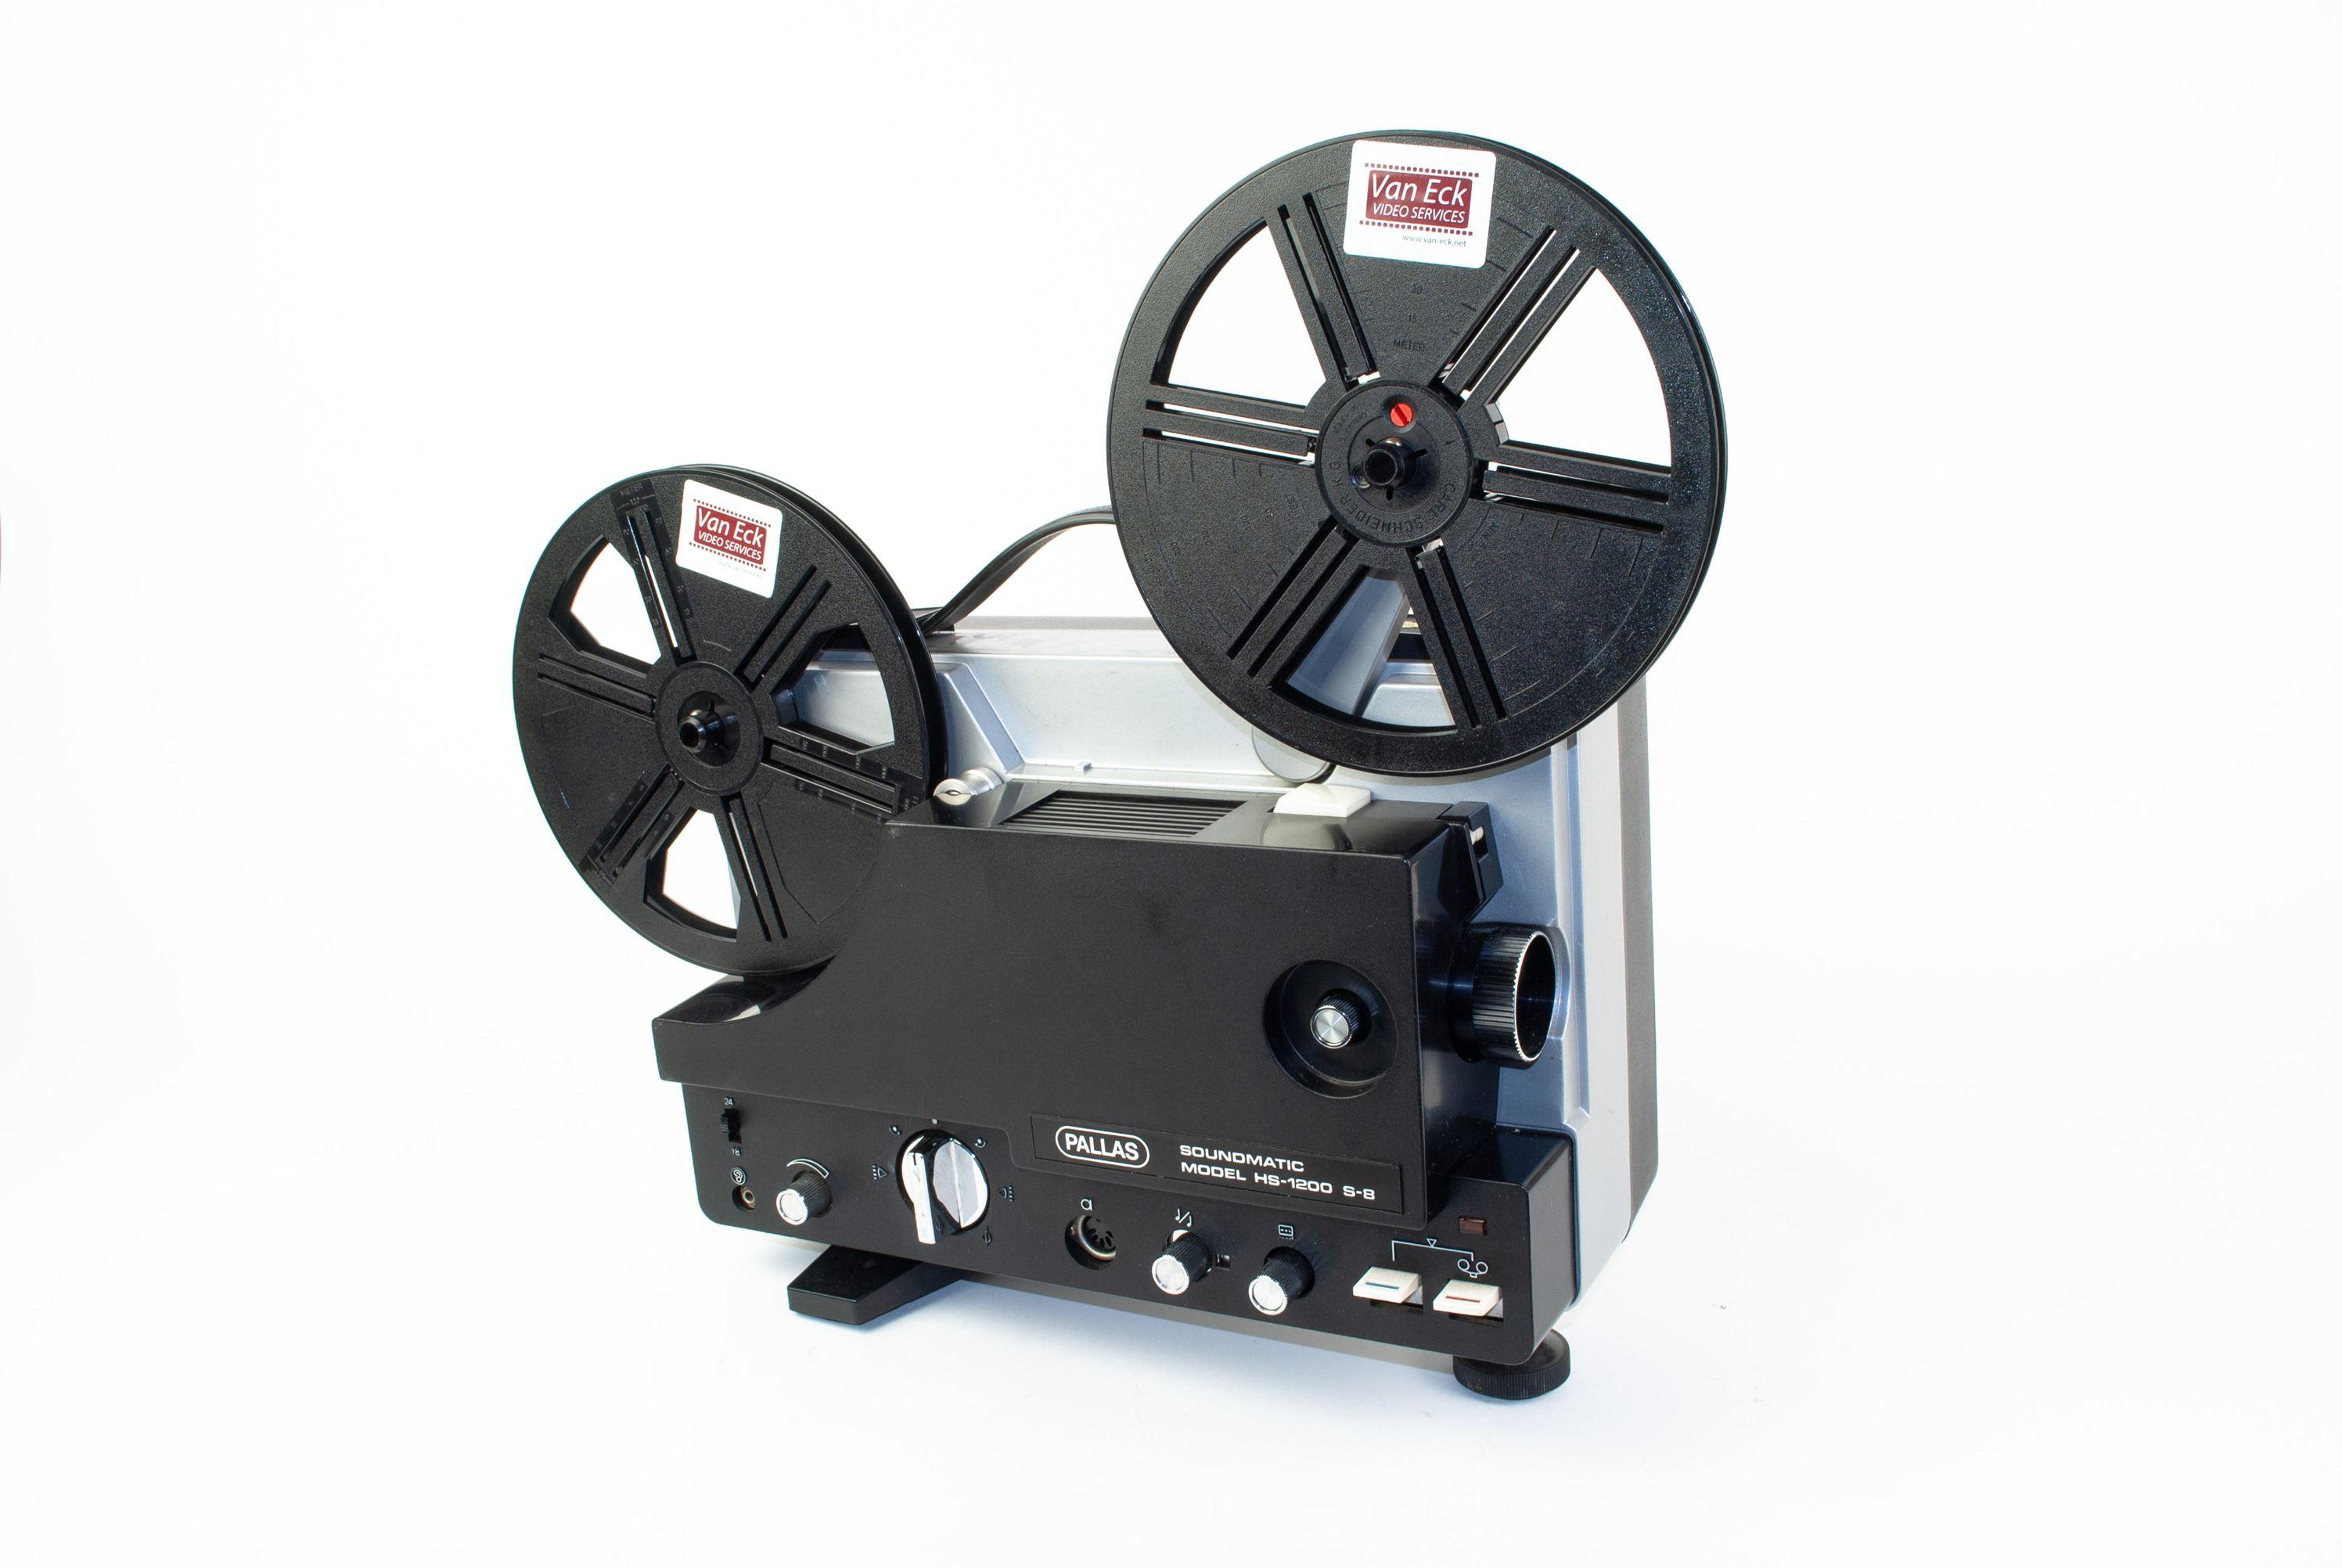 Soundmatic HS-1200 S-8 (model LSP-510)